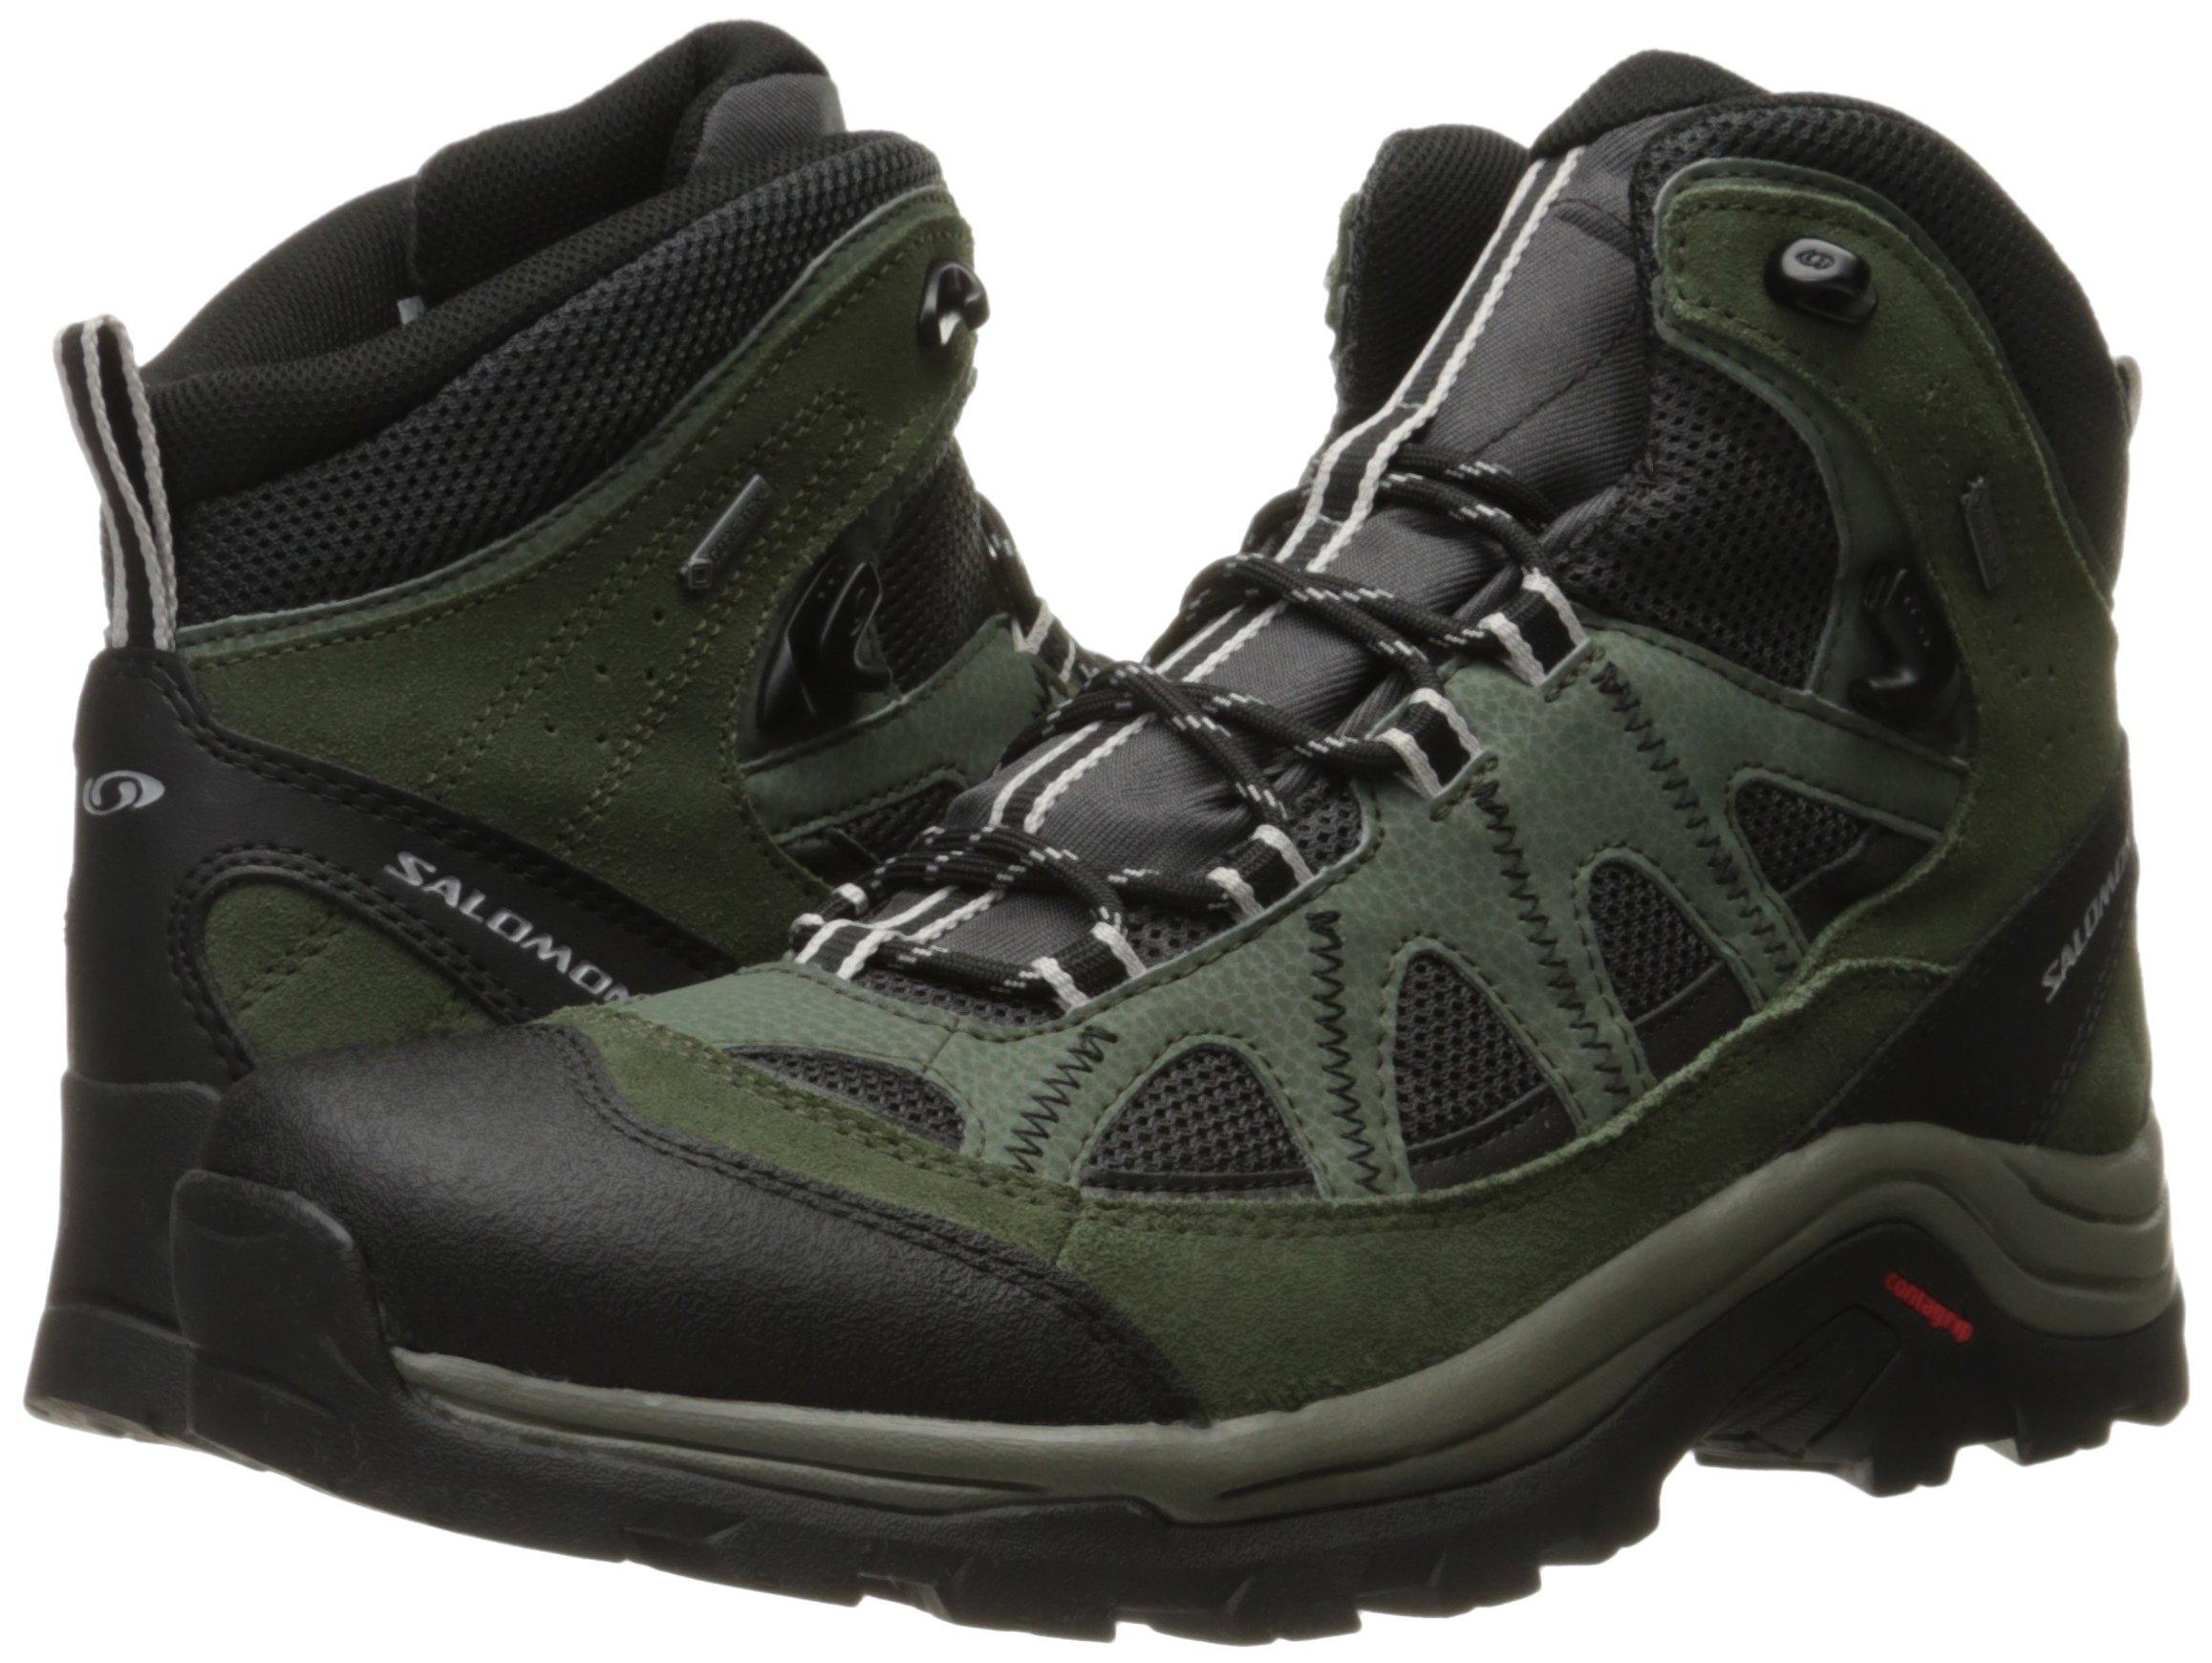 1cff239326c Salomon Men's Authentic LTR GTX Backpacking Boot - AUTHENTIC LTR GTX ...